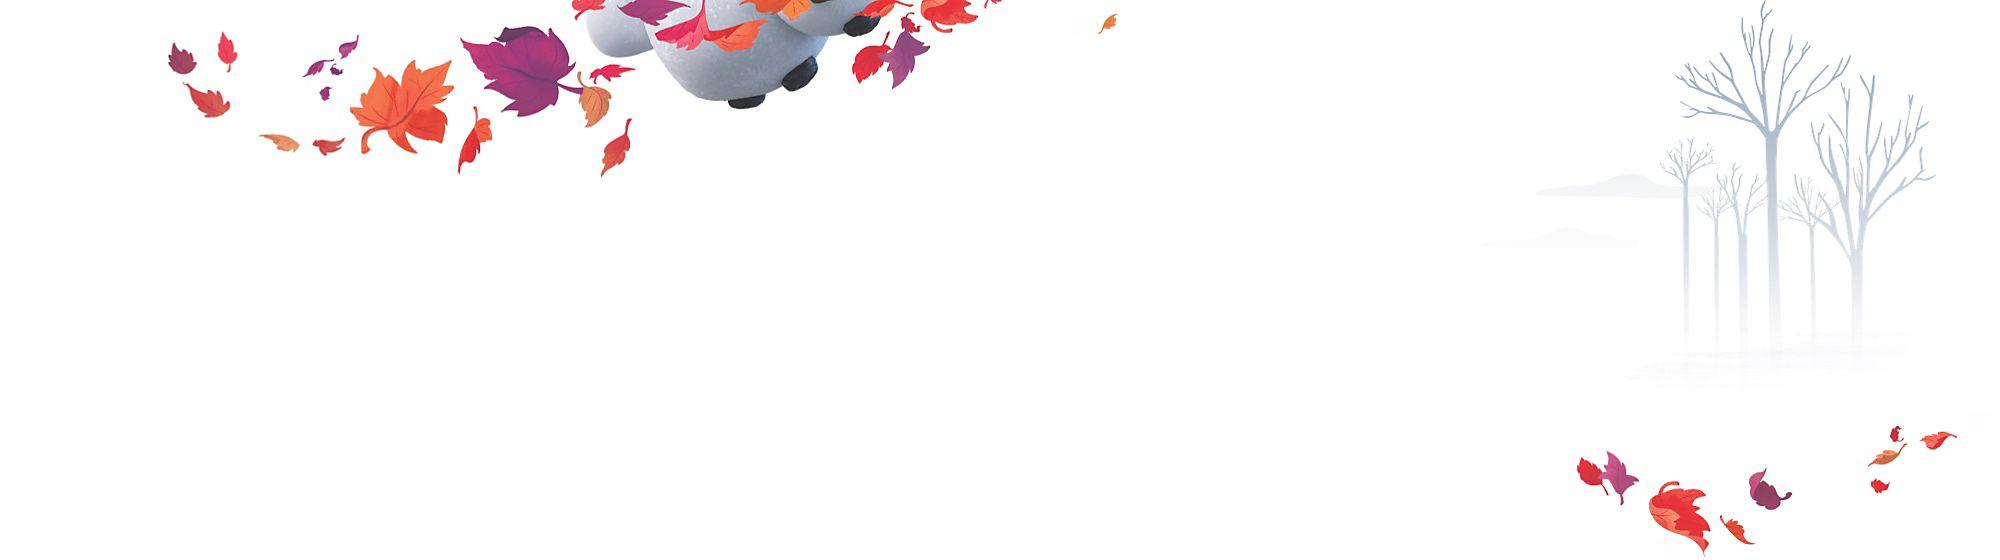 Store Locations Aberdeen, Belfast, Birmingham, Blackpool, Bluewater, Bromley, Cambridge, Cardiff, Copenhagen, Dublin, Glasgow, Lakeside, Leeds, Leicester, Liverpool, Manchester Arndale, Meadowhall, Metro, Milton Keynes, Nottingham, Oxford Street, Perth, Romford, Shrewsbury, Stockholm, Stratford, Sunderland, Warrington, Westfield, York